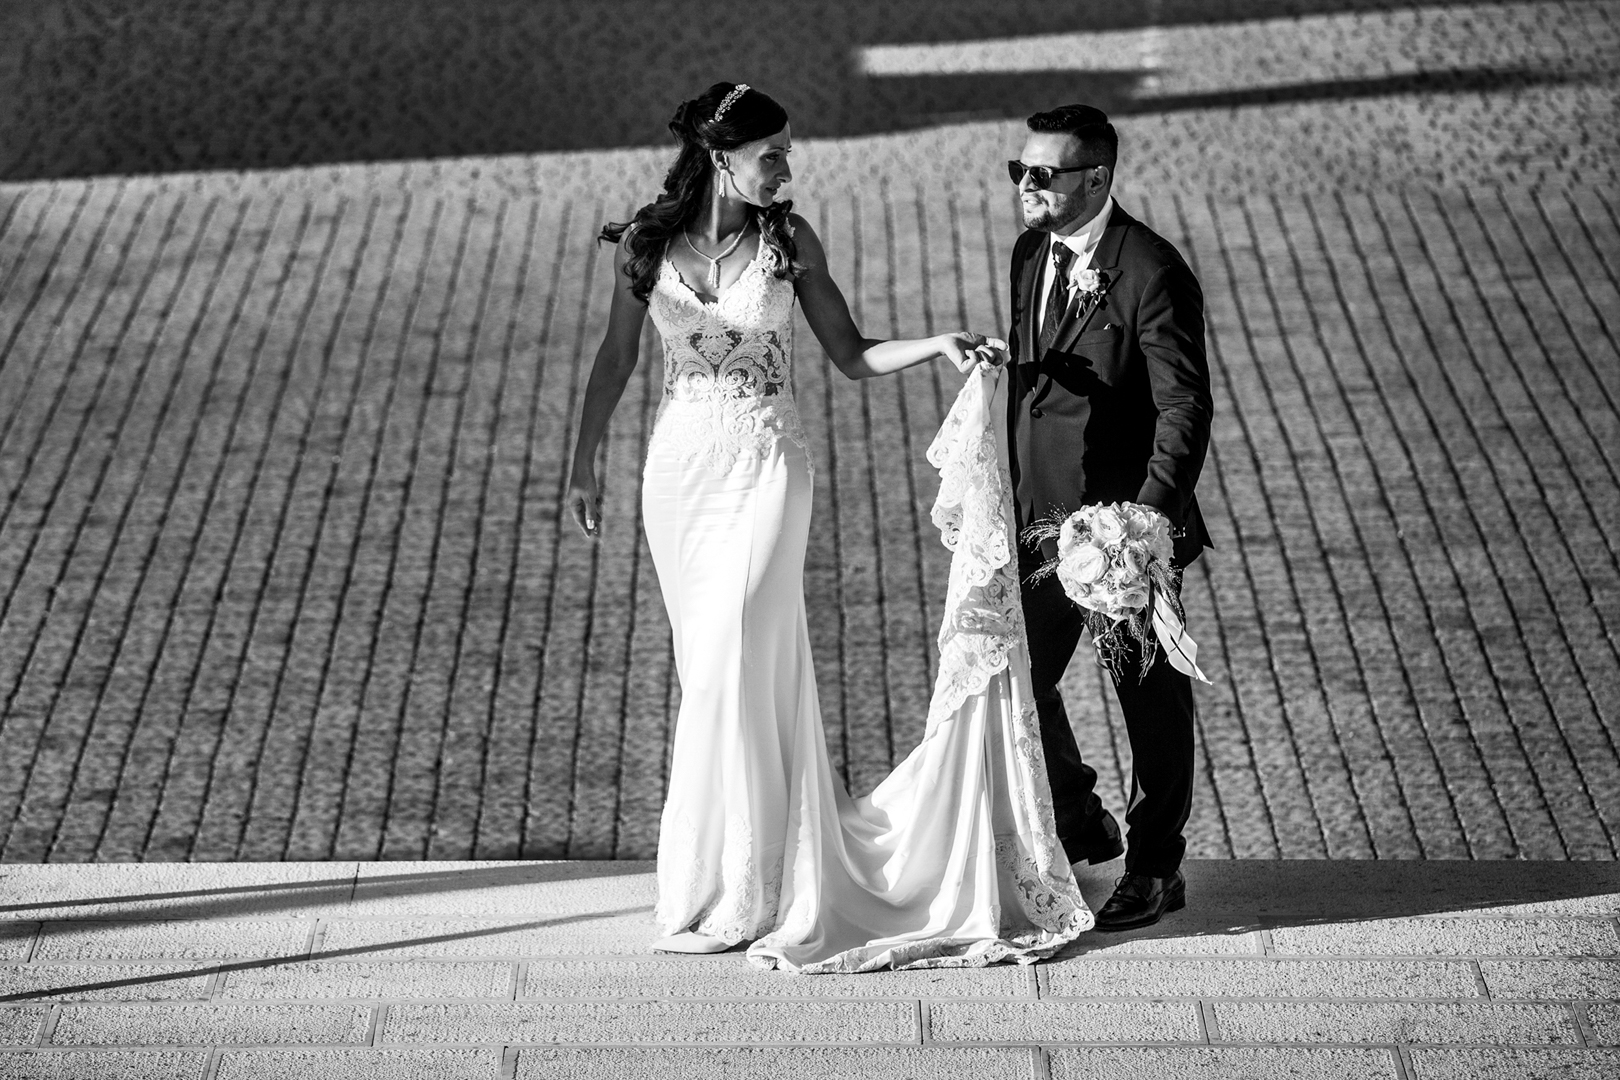 30 gianni-lepore-fotografo-new-lions-molfetta-matrimonio-bride-groom-weddingday